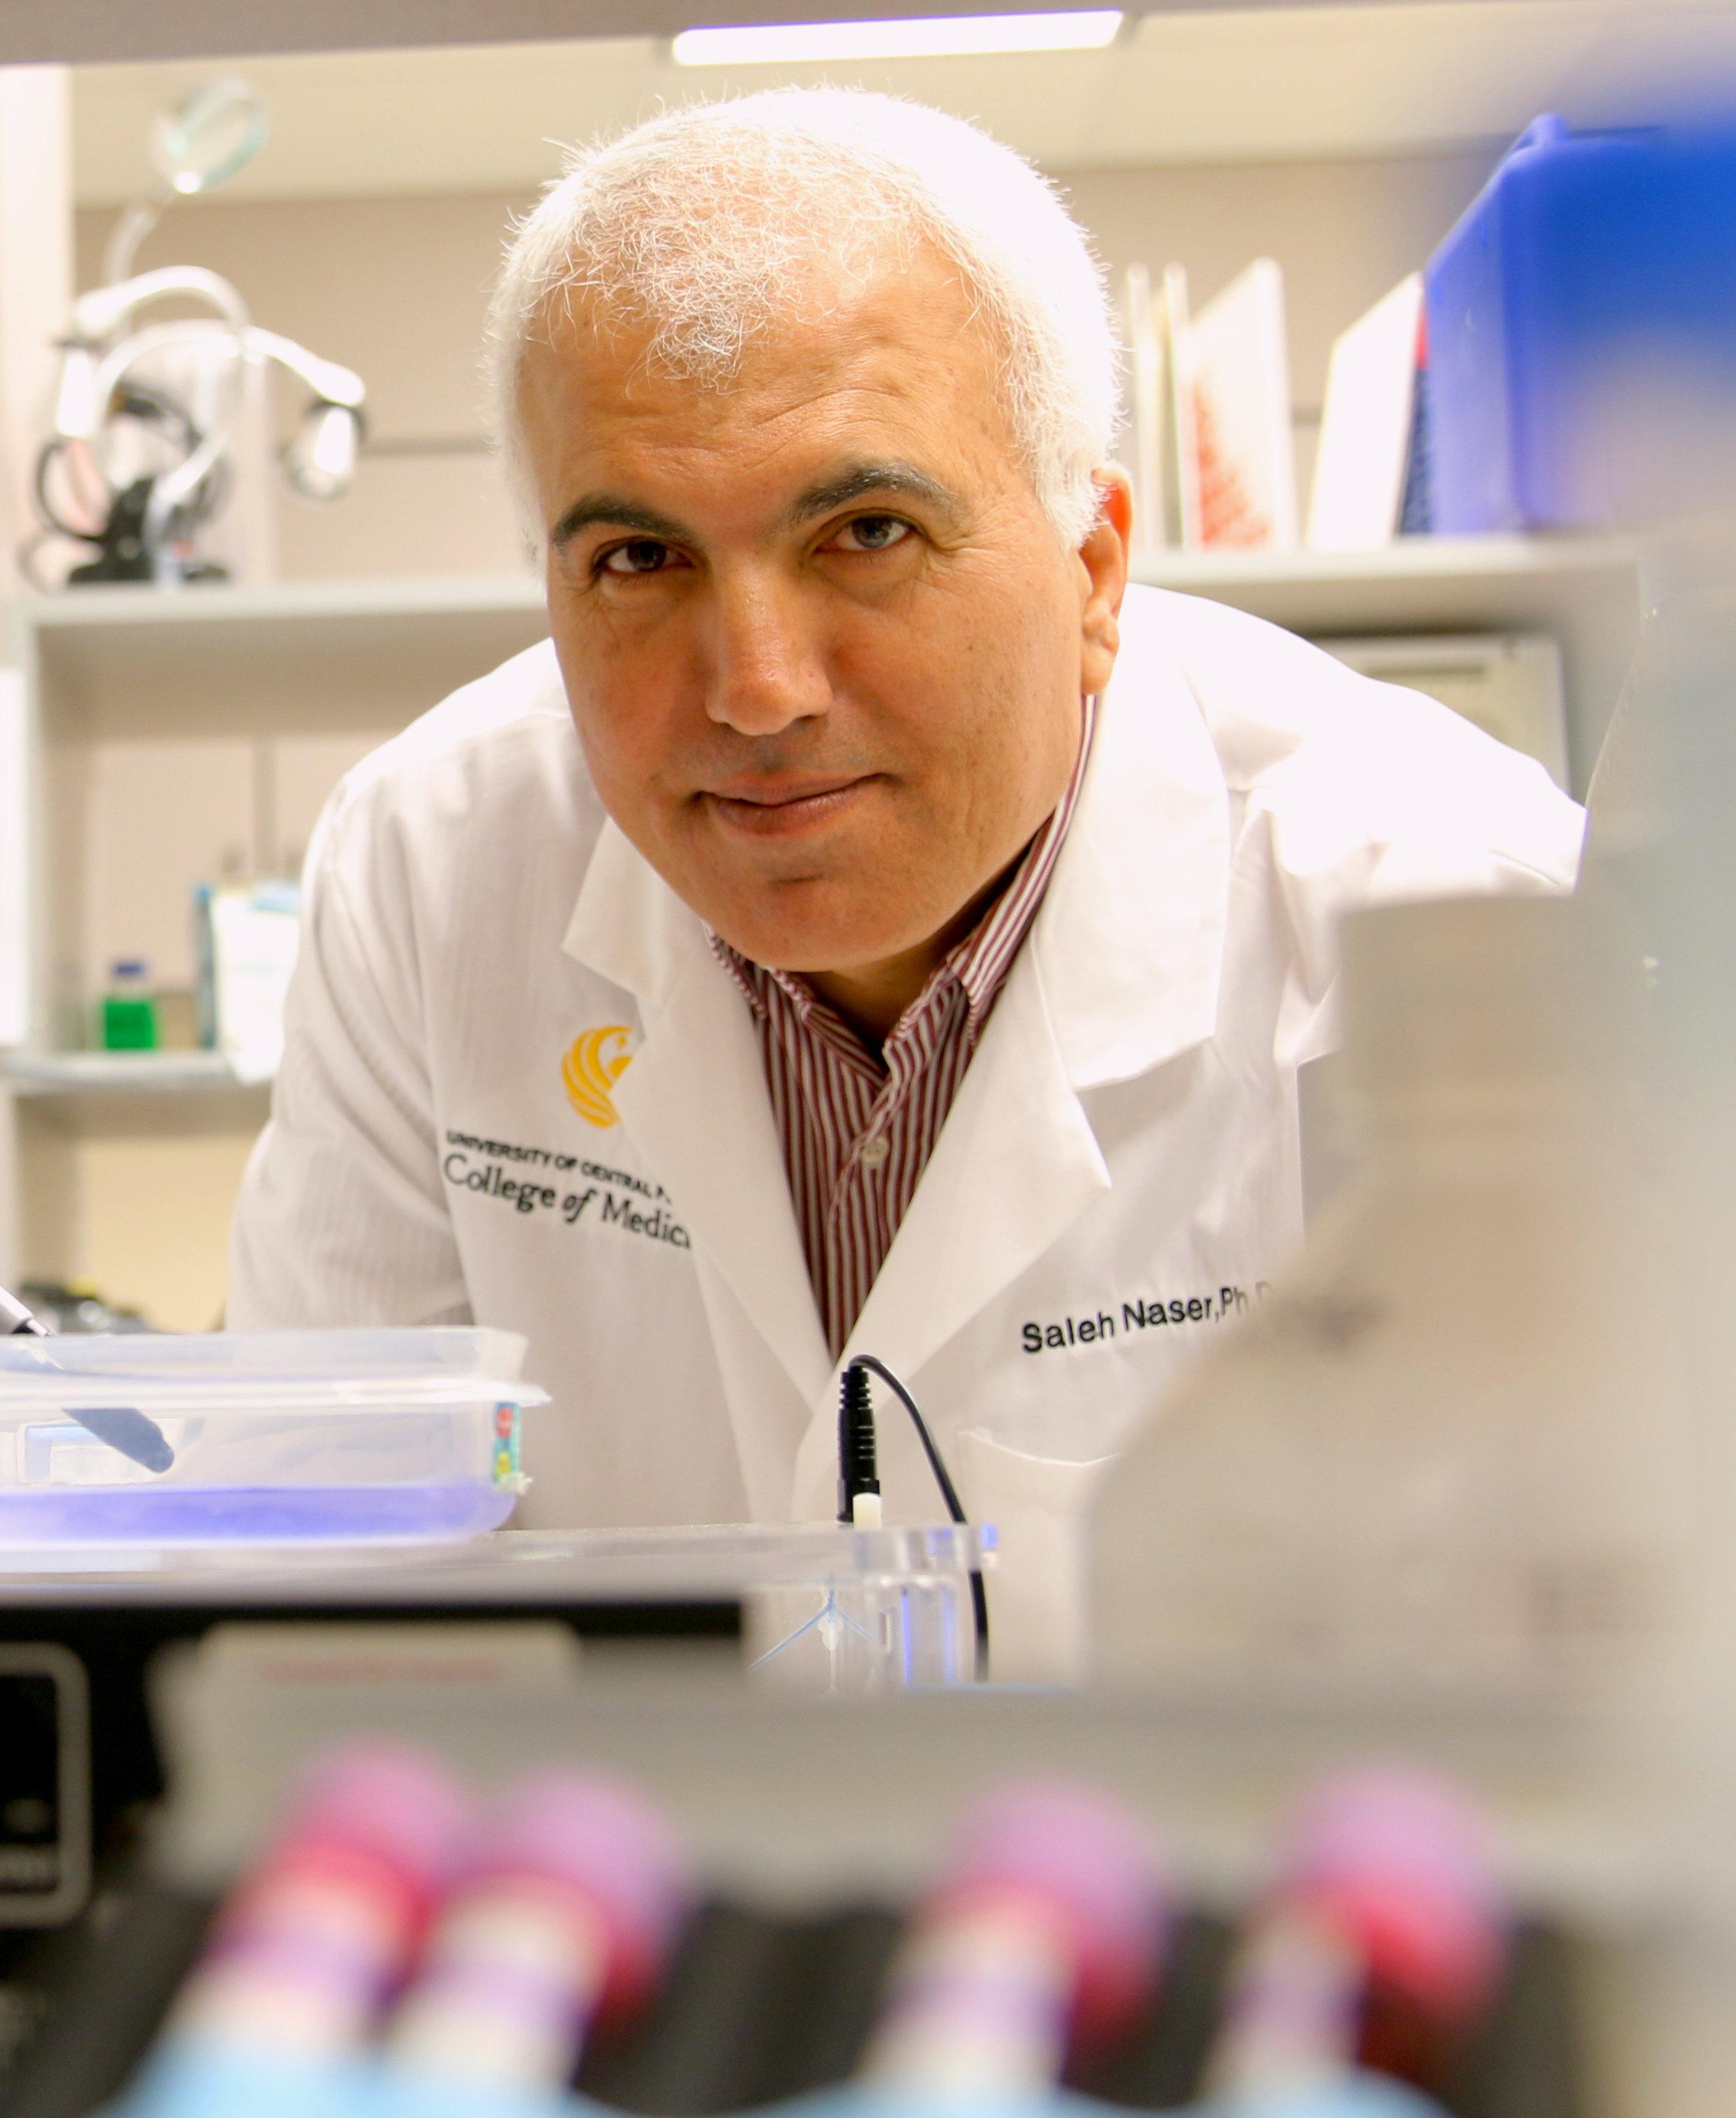 Study finds bacteria in milk linked to rheumatoid arthritis